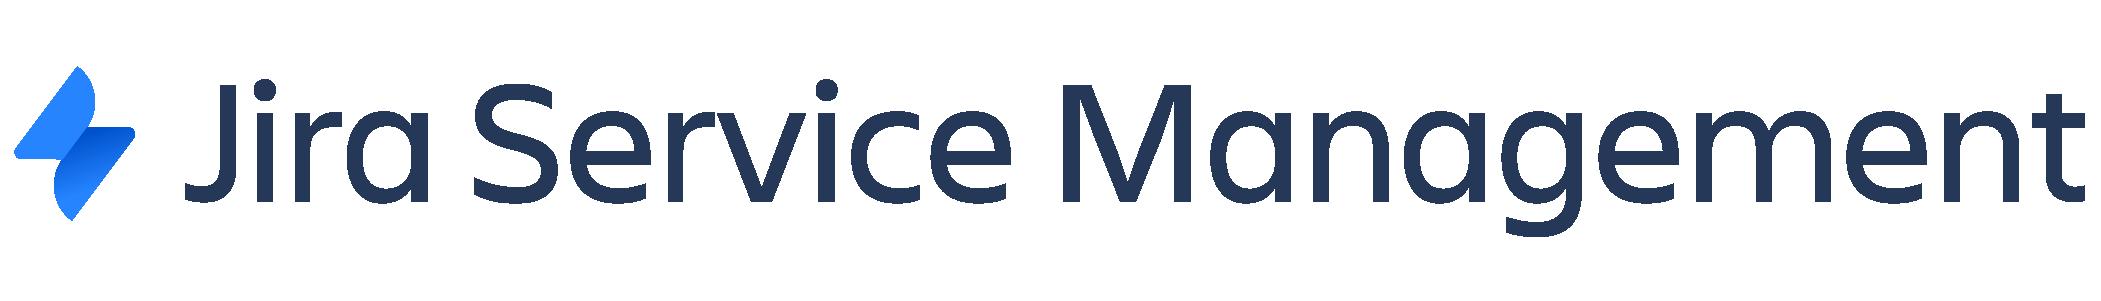 jira-service-management-logo-gradient-blue